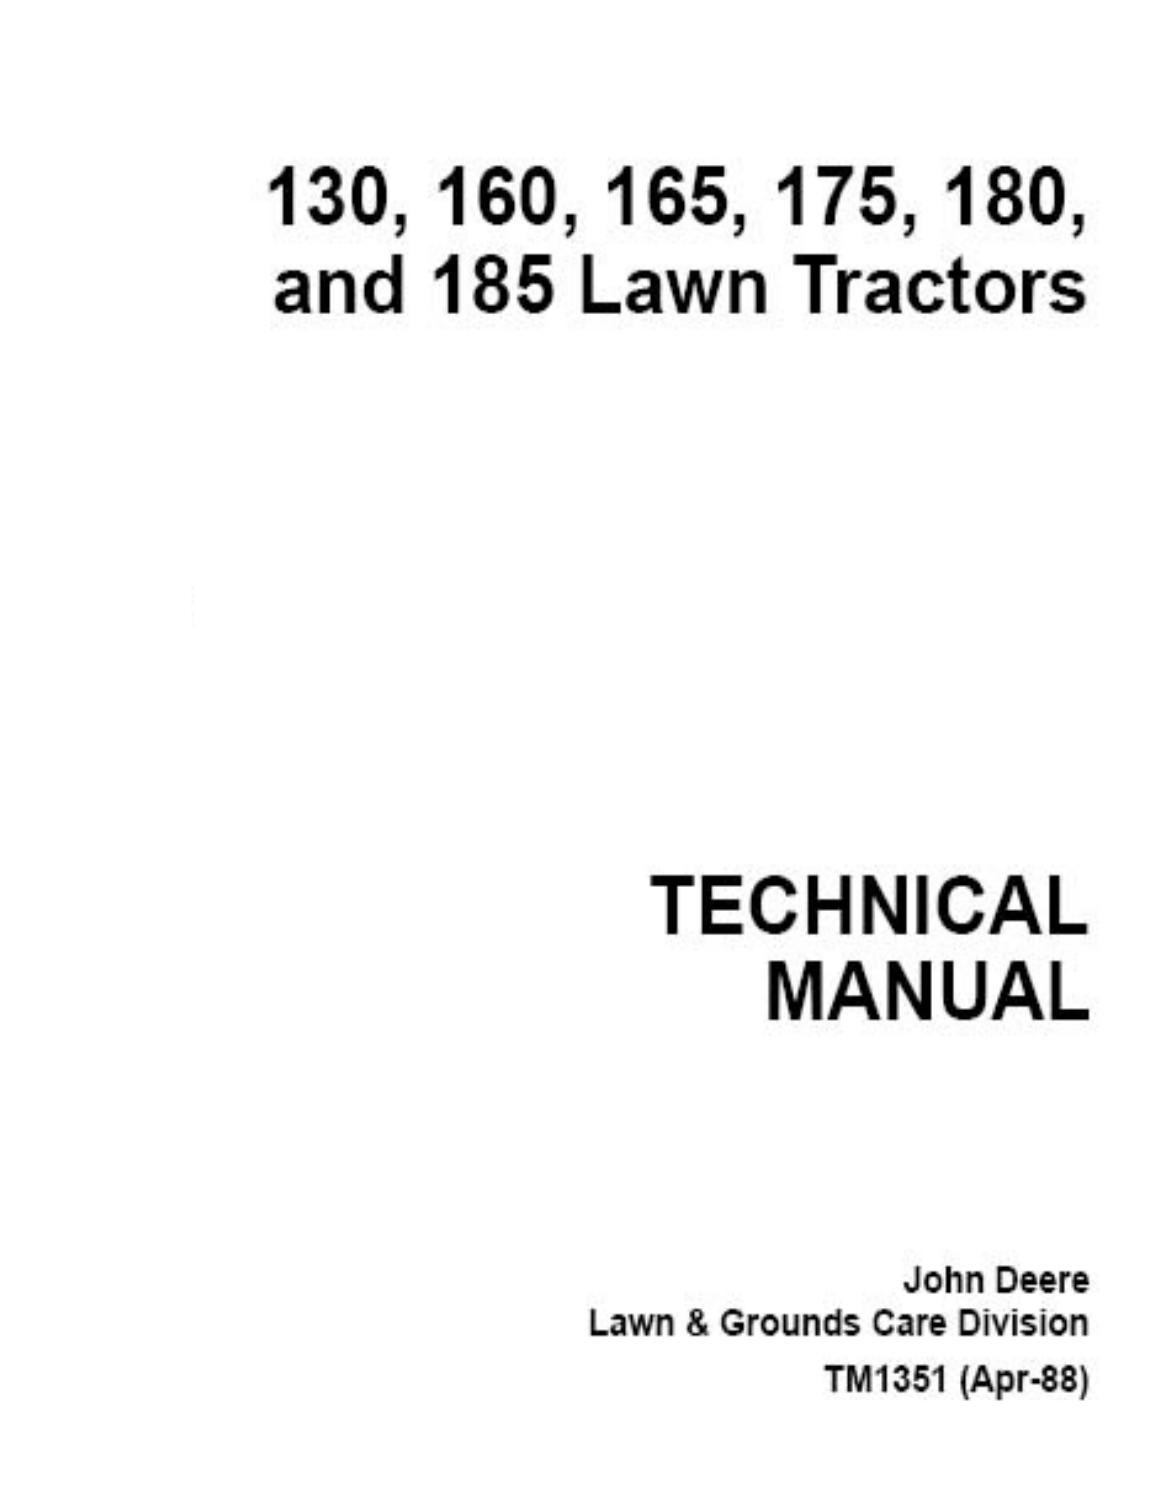 John deere 185 hydro manual by Razvan Alexa - issuu